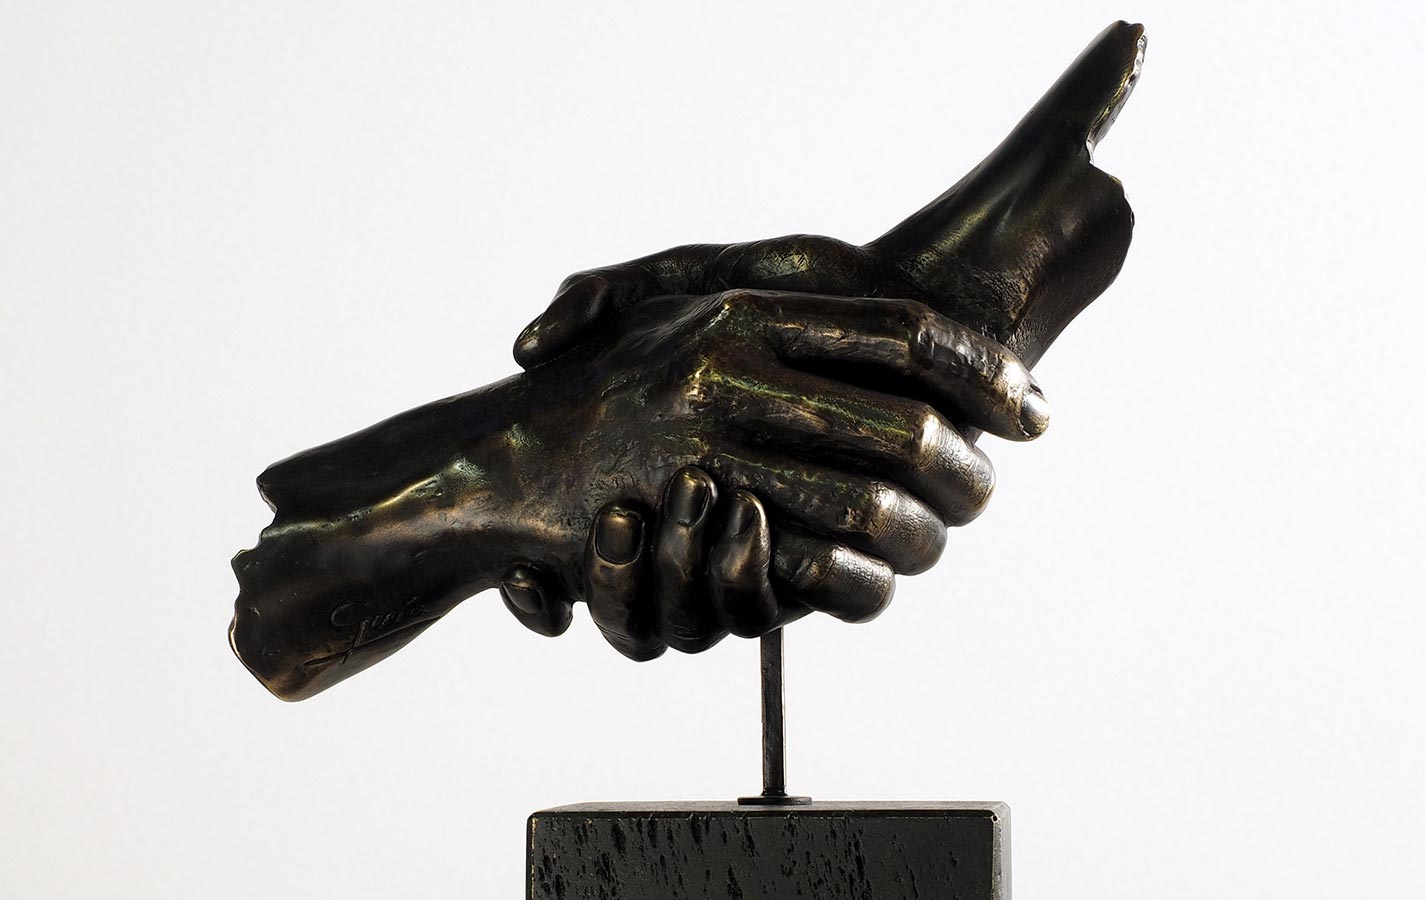 Regalar arte: 10 ideas para regalar esculturas